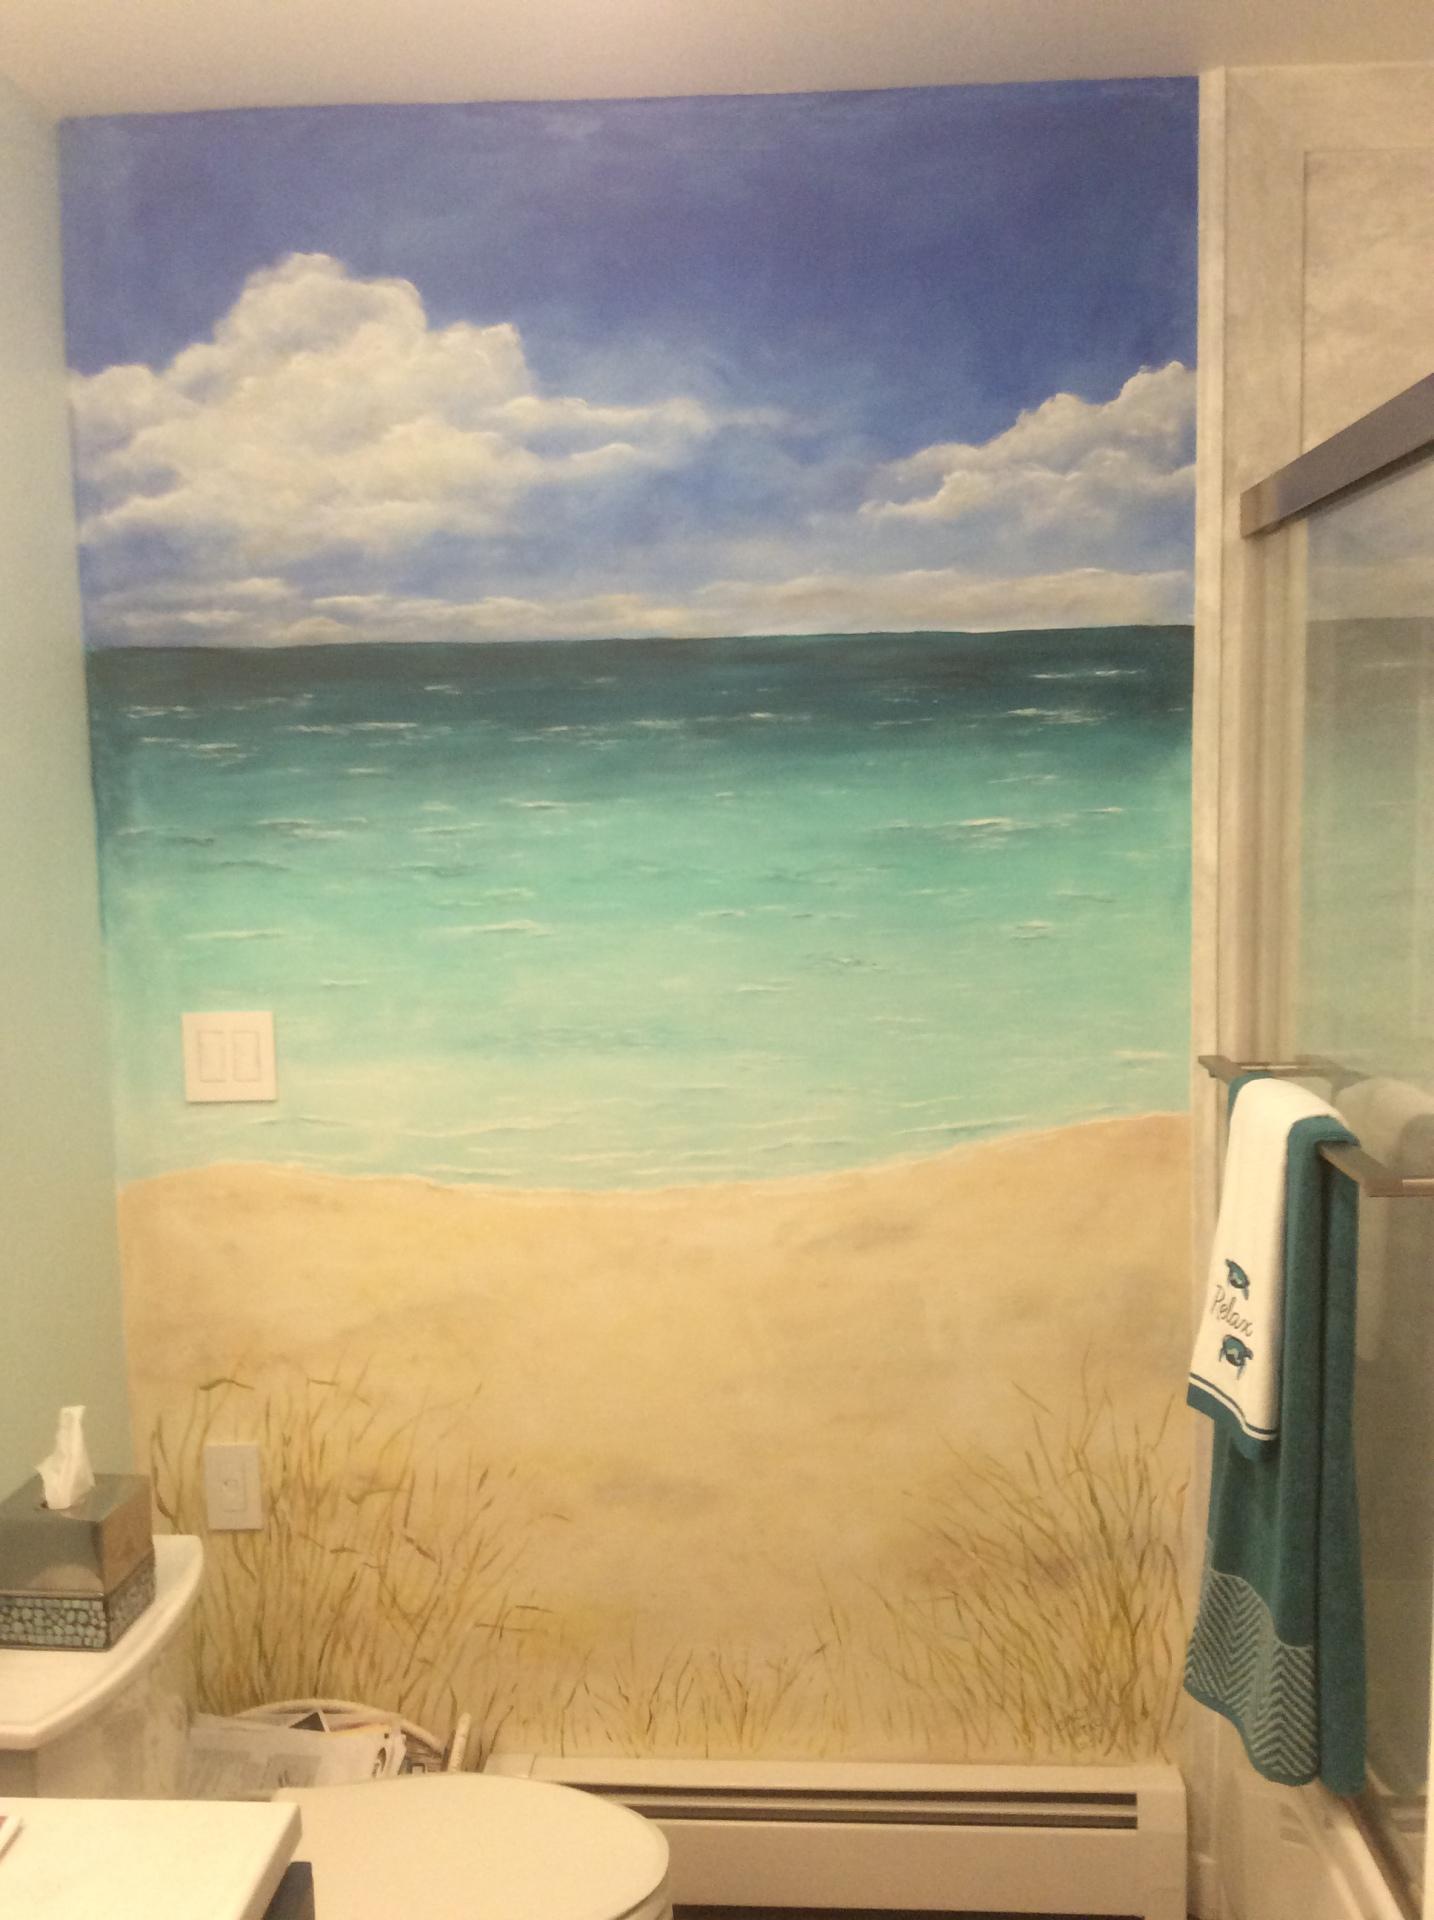 Beach scene wall mural